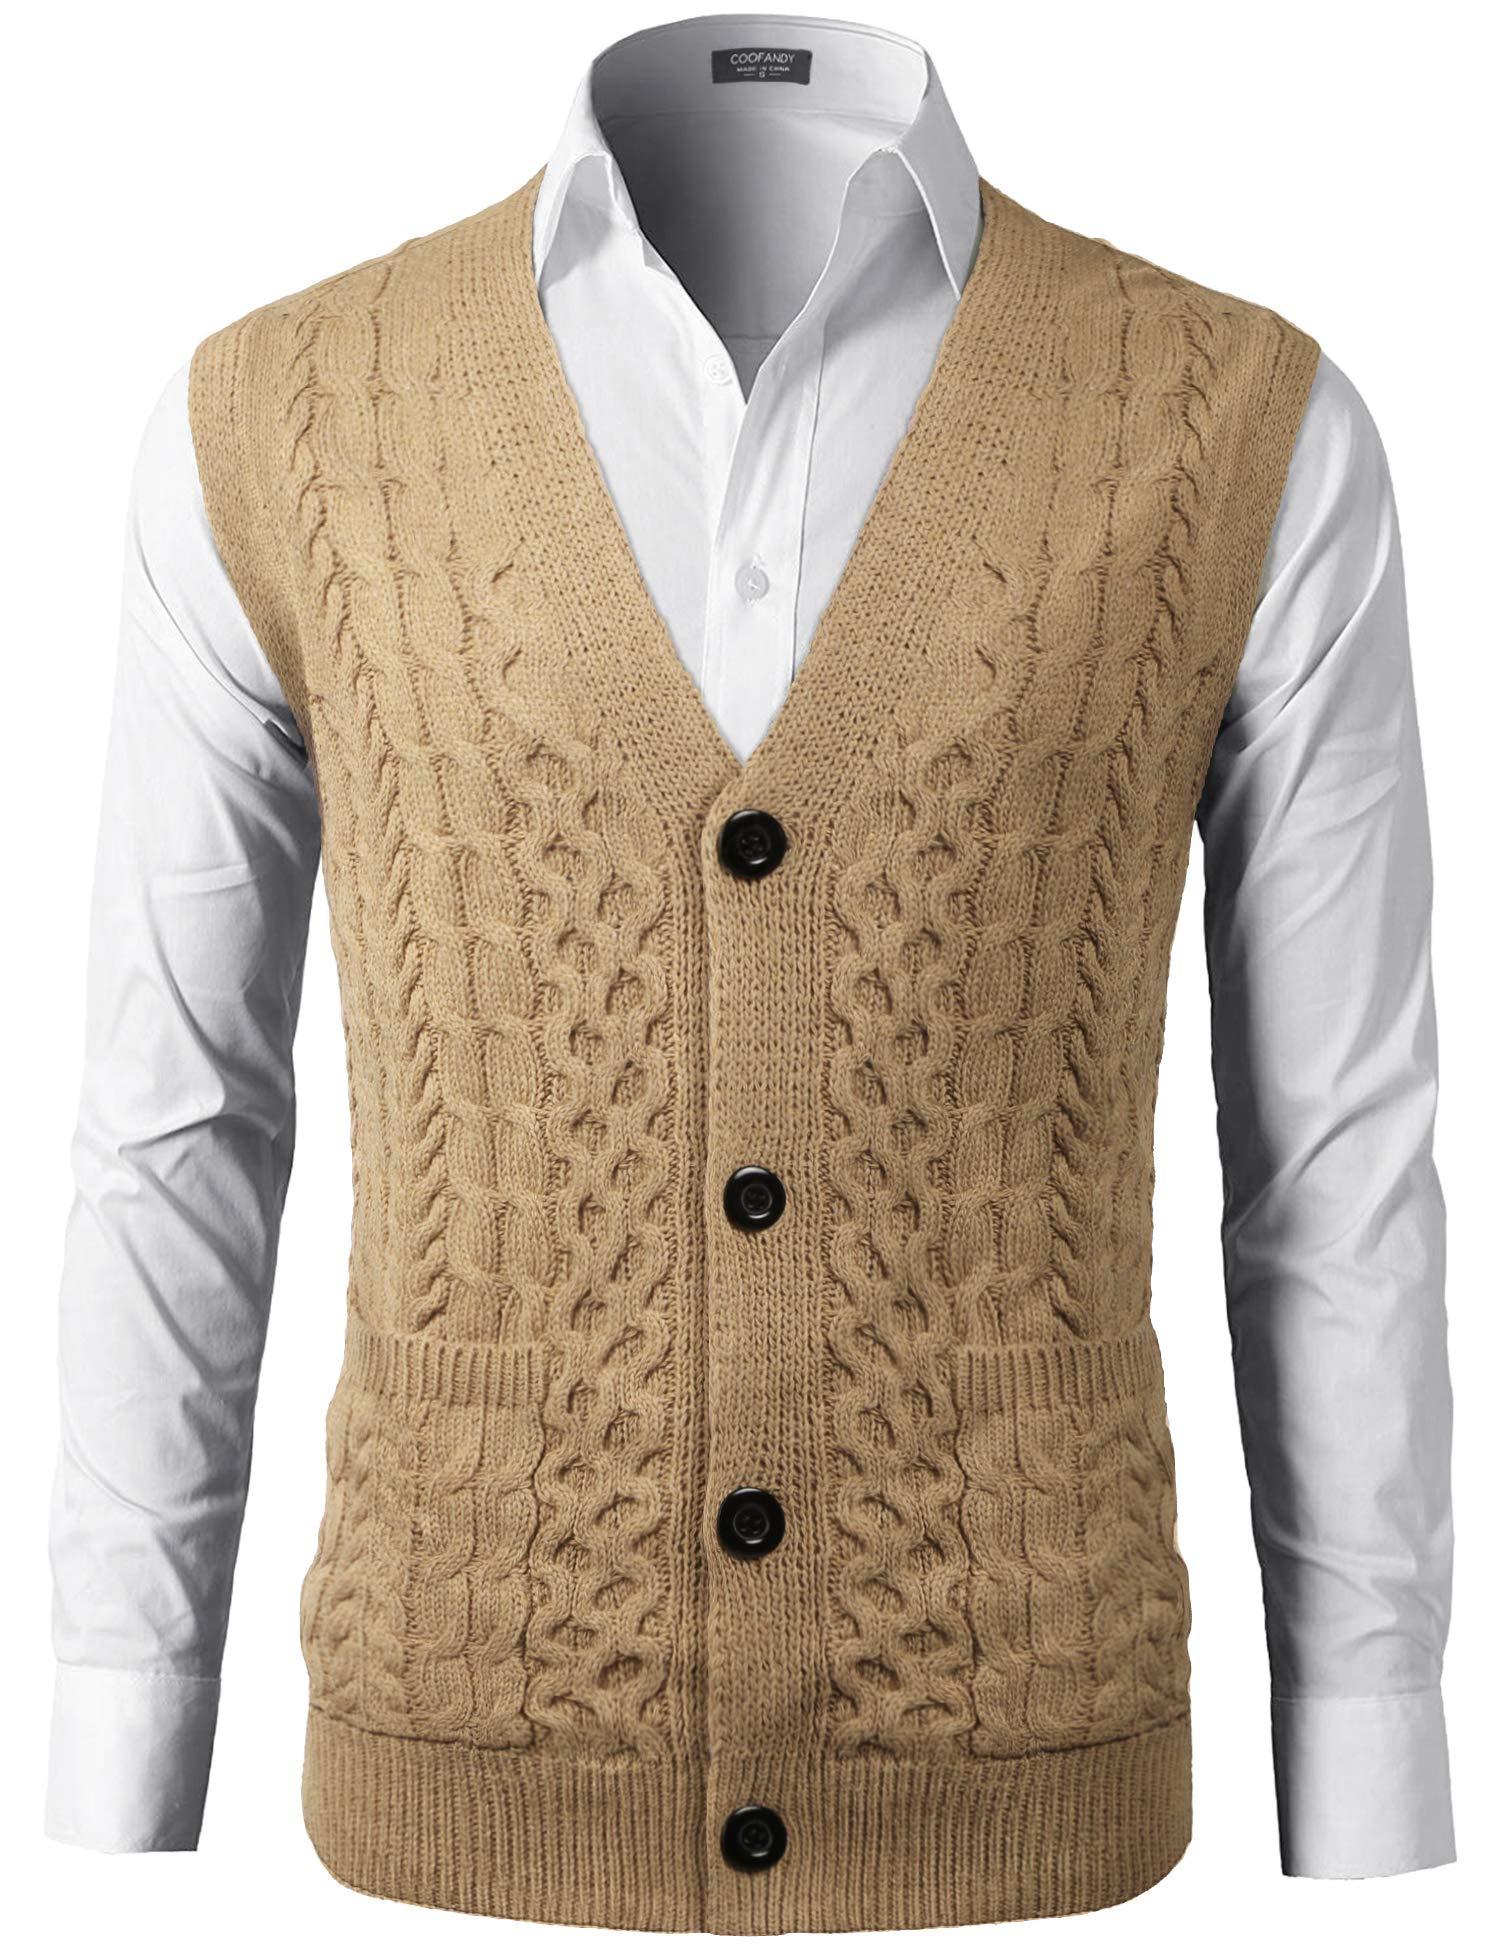 COOFADNY Mens Sweater Vest V-Neck Sleeveless Knit Cardigan Waistcoat with Pocket Khaki by COOFANDY